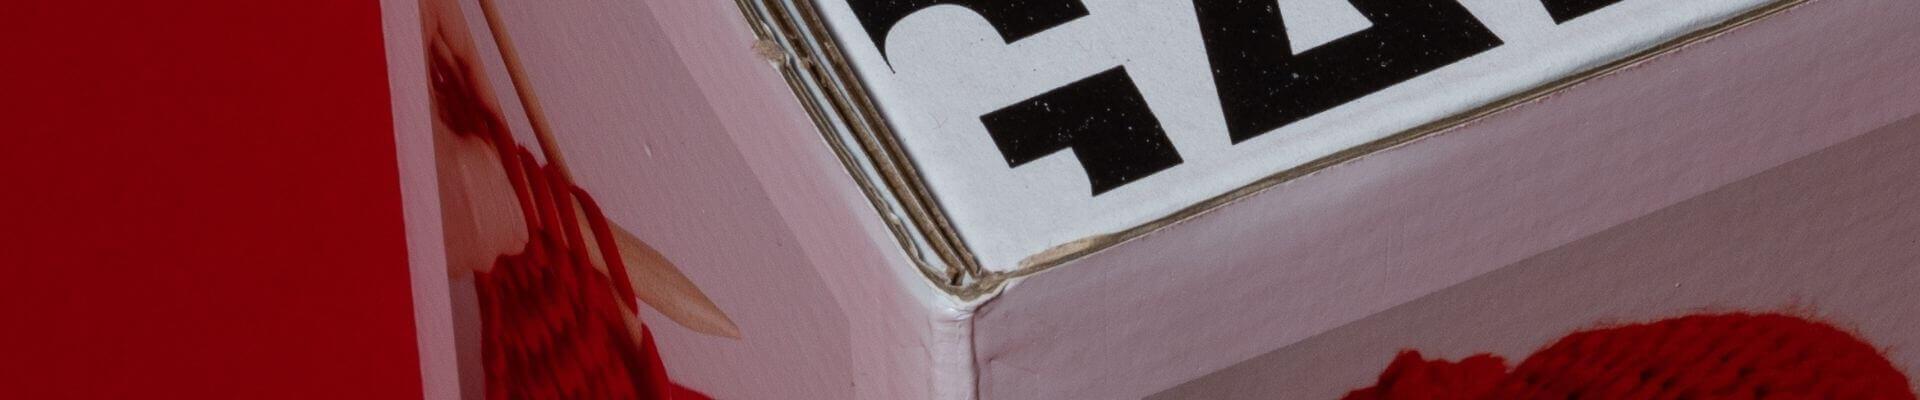 Personalisation - Material - Corrugated Cardboard